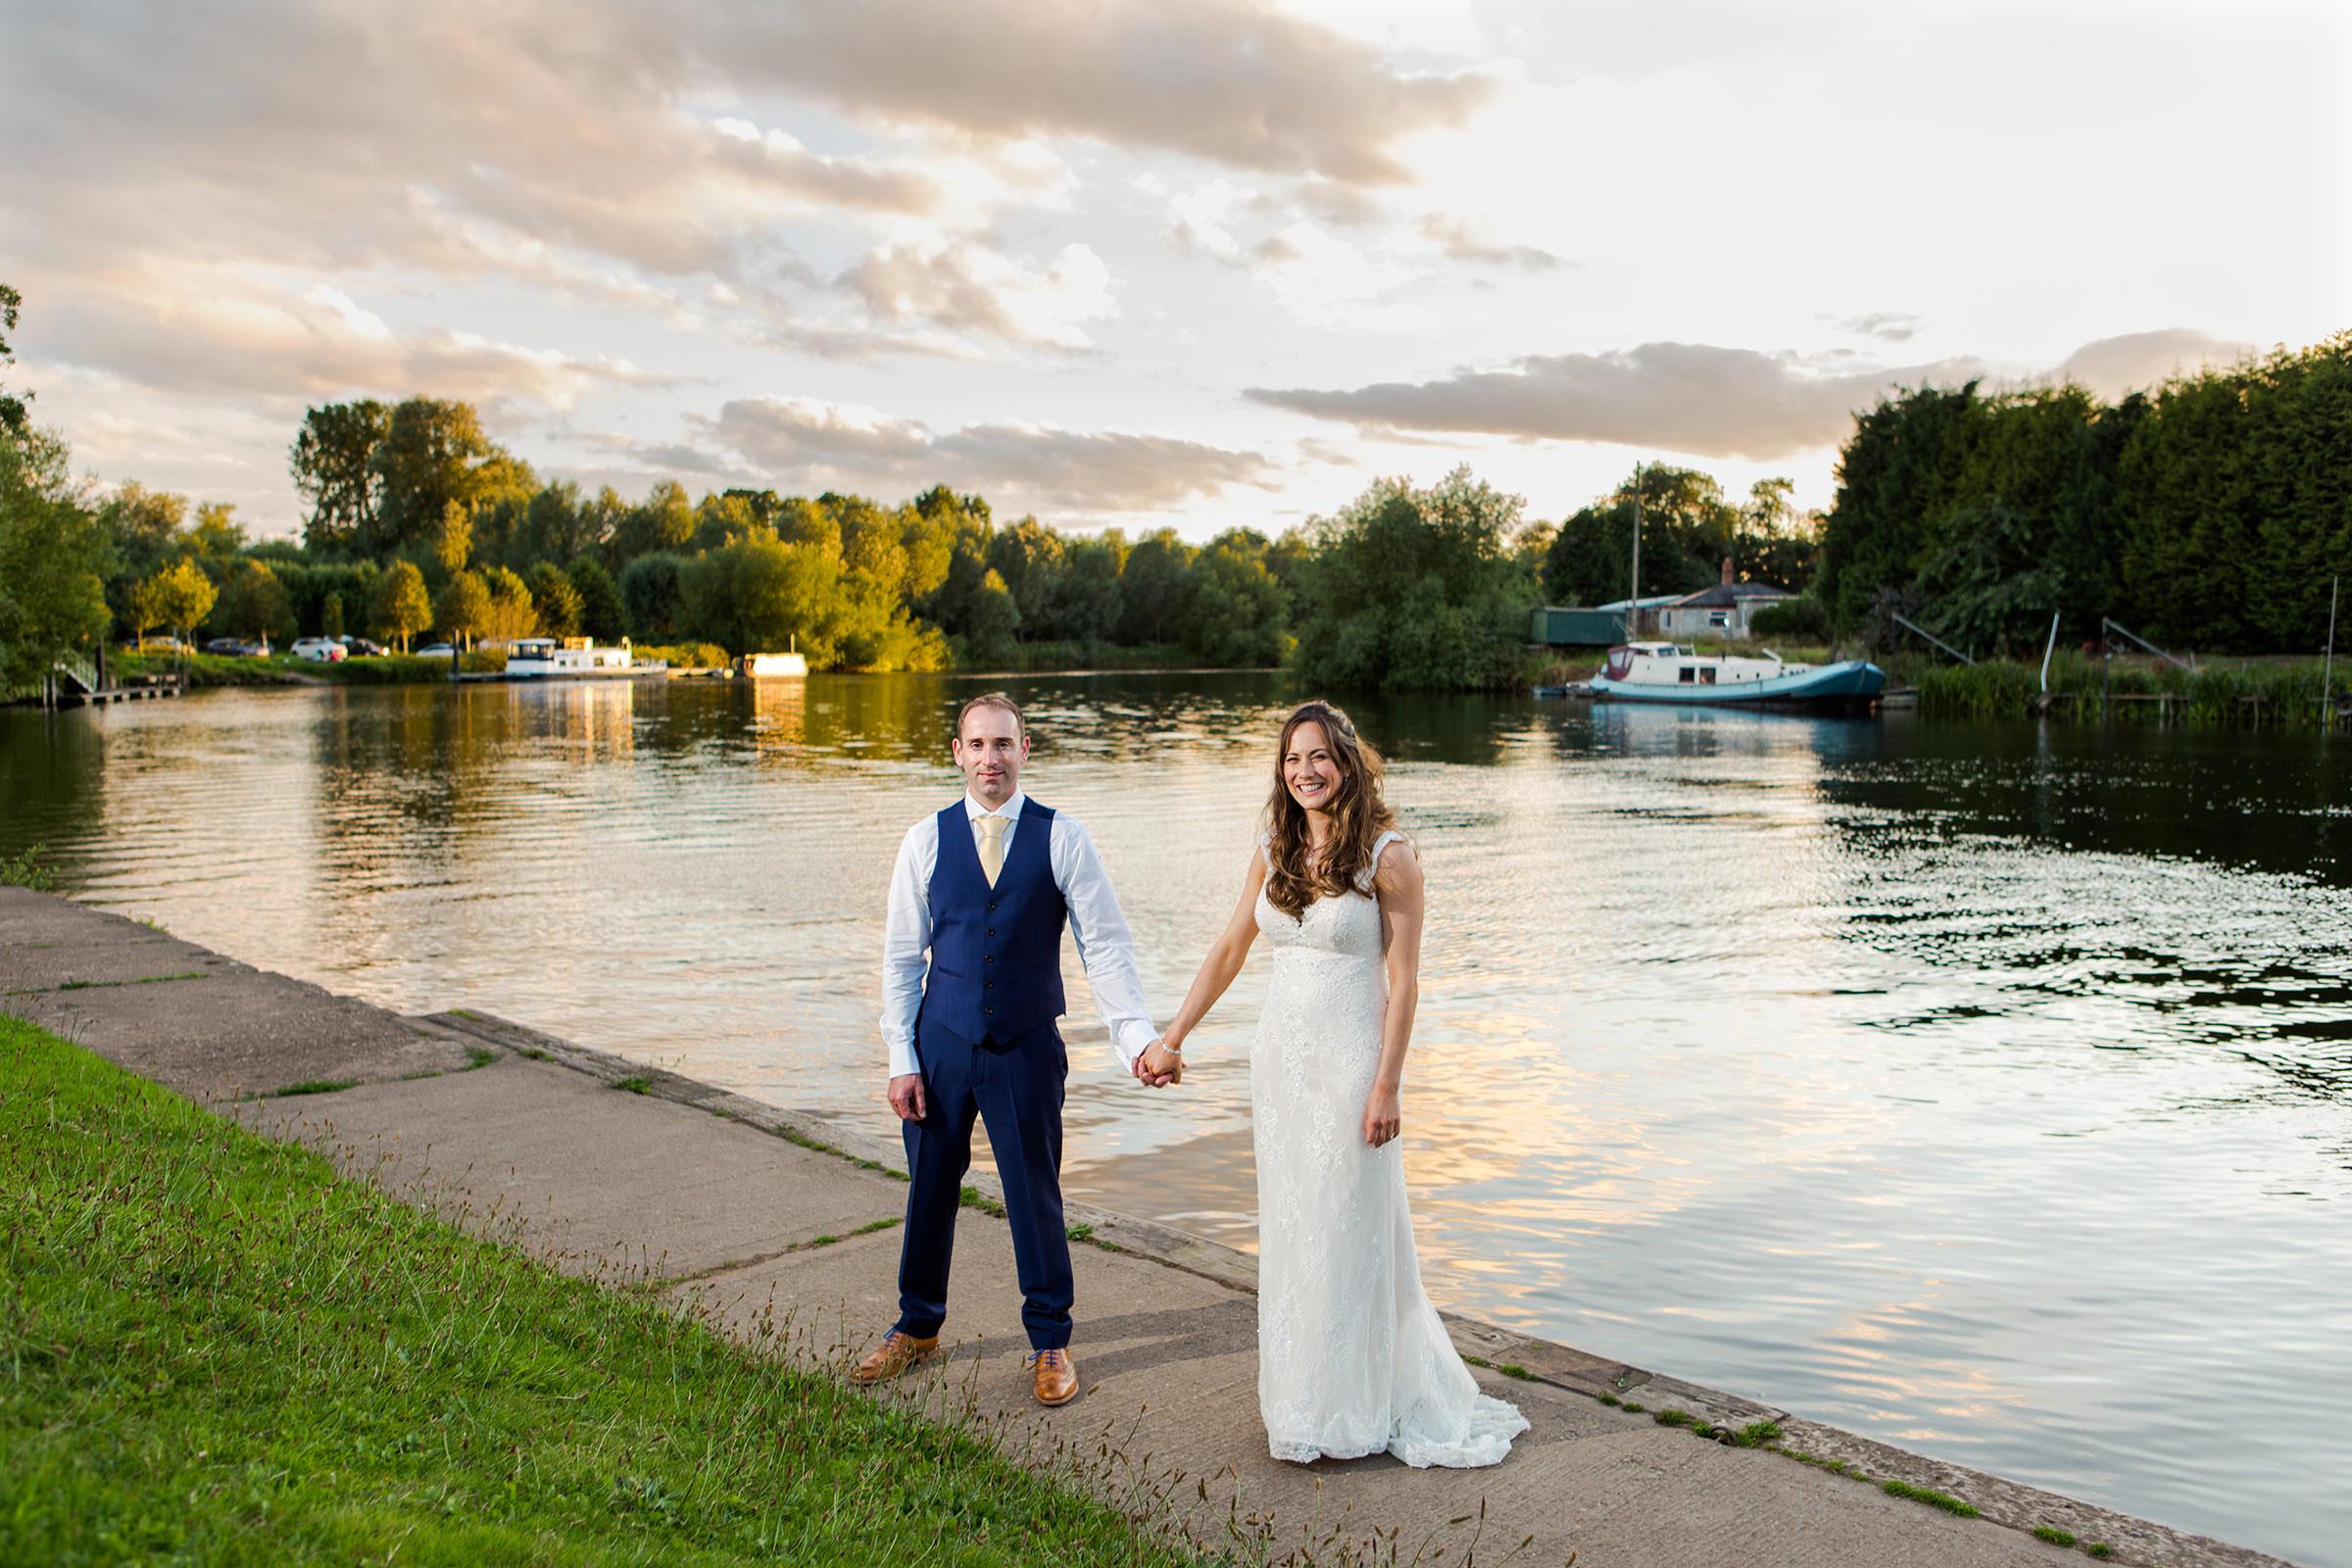 Yorkshire Wedding Photographer James Phillip